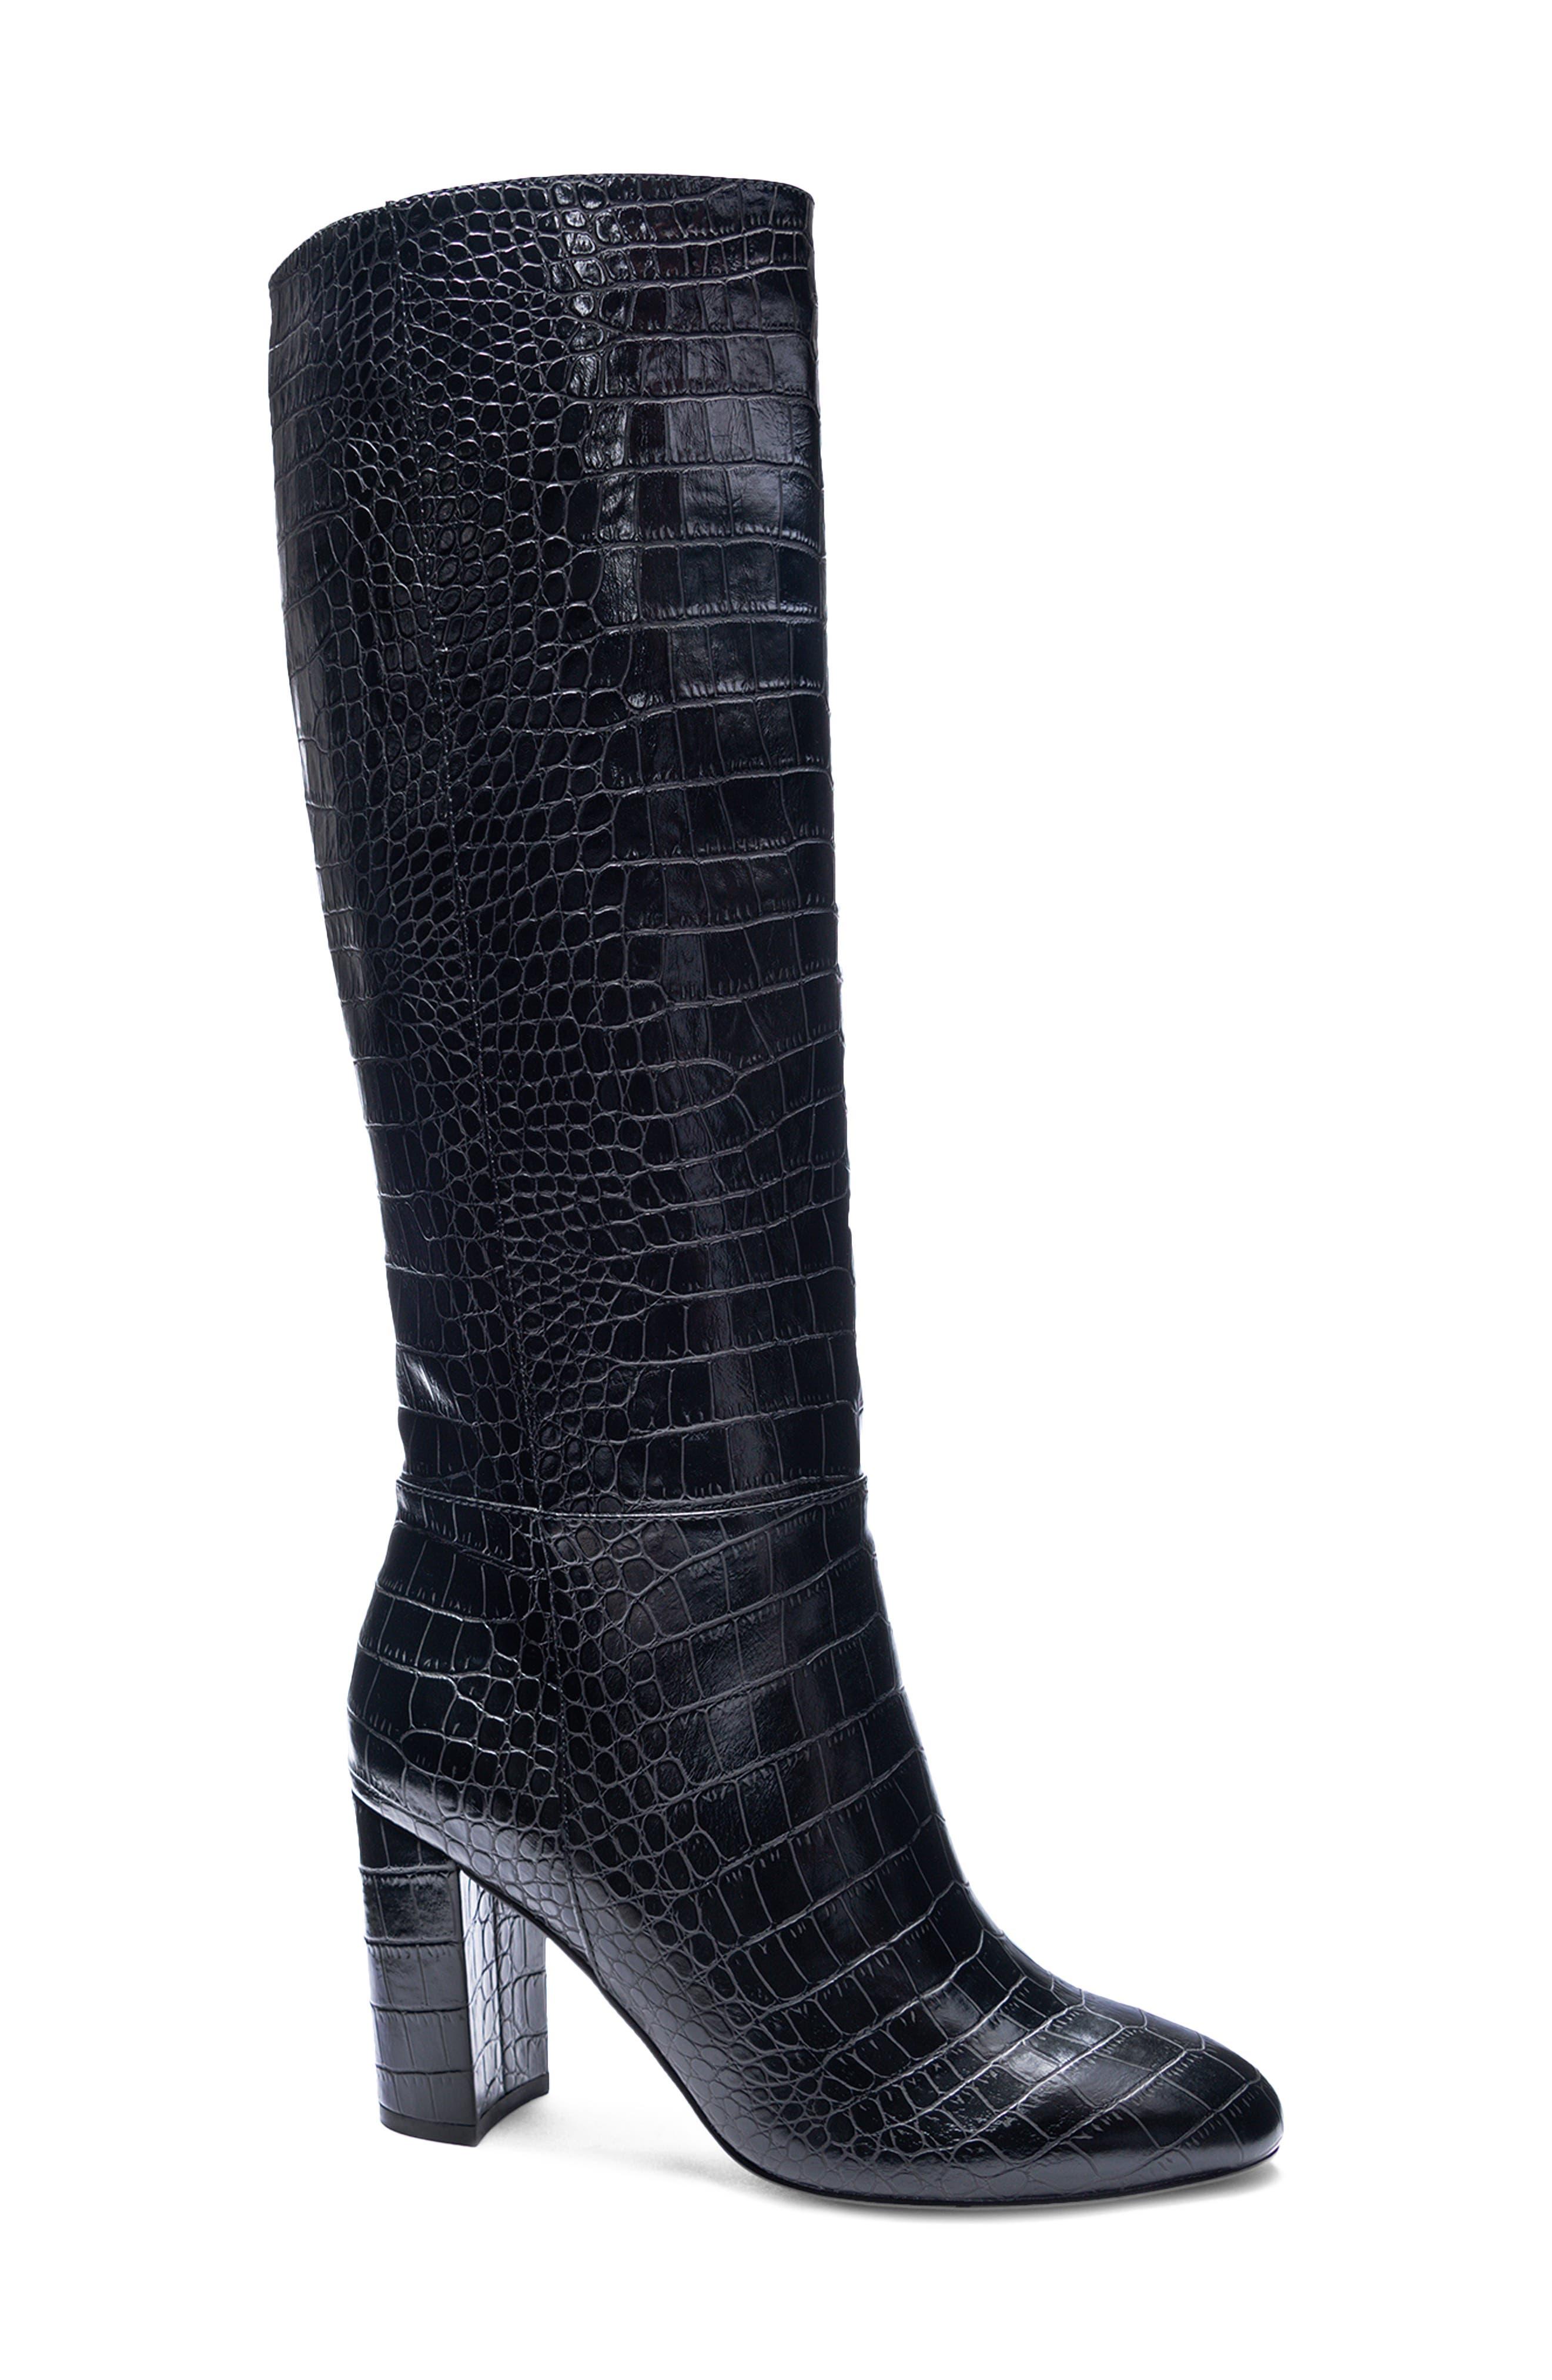 Krafty Knee High Boot